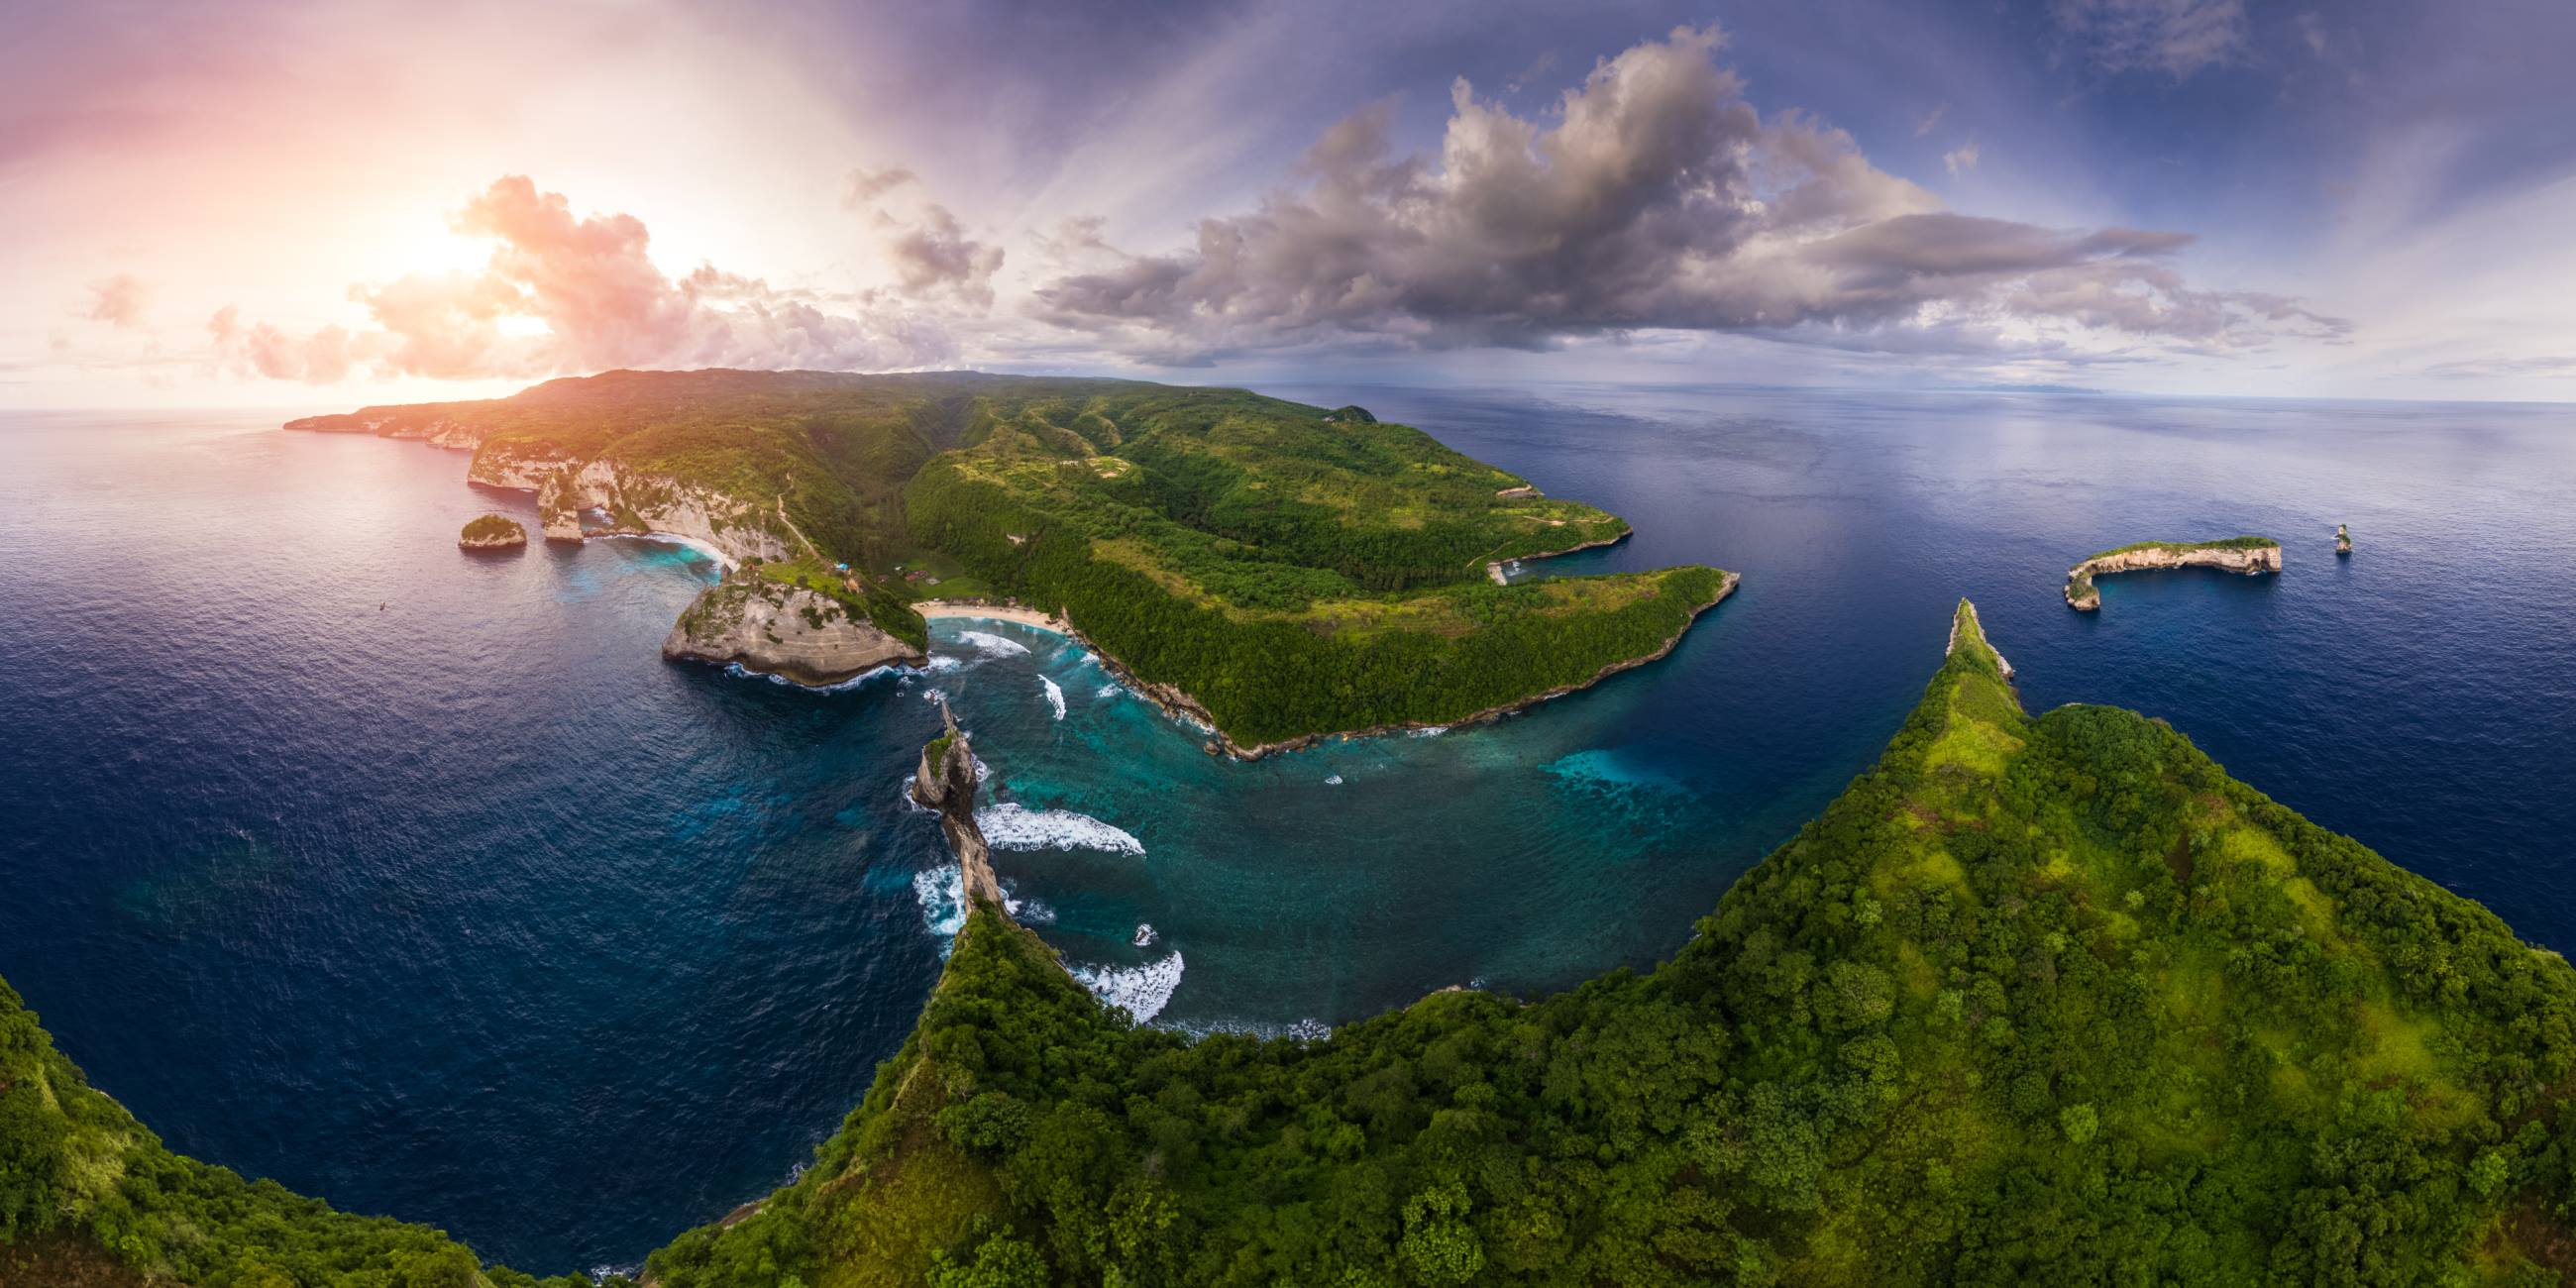 Where Is Bali Island Located